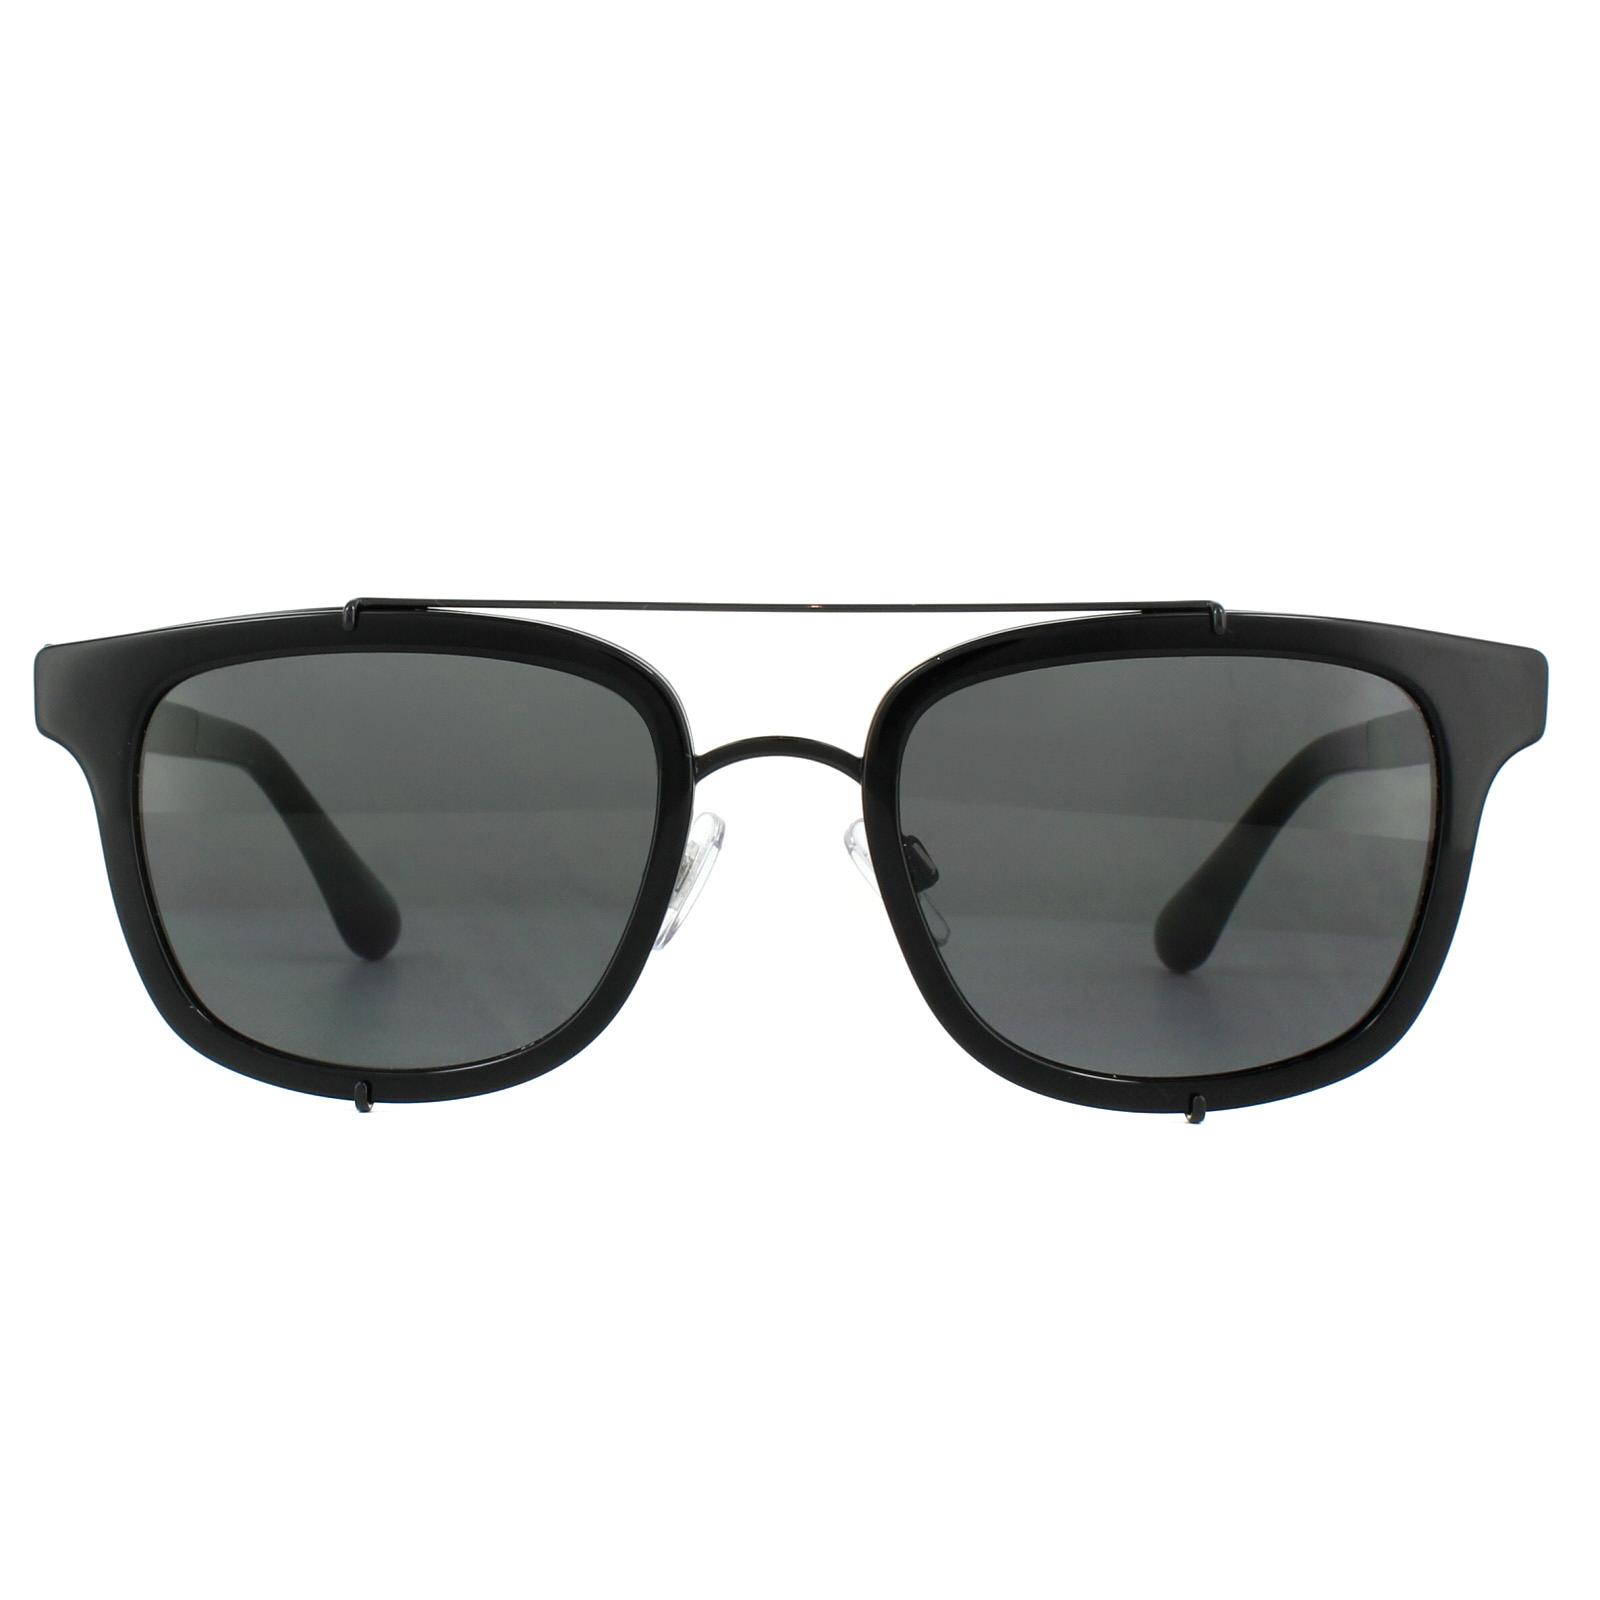 d1d11ba8736 Dolce   Gabbana Sunglasses DG2175 501 87 Black Grey 8053672778960